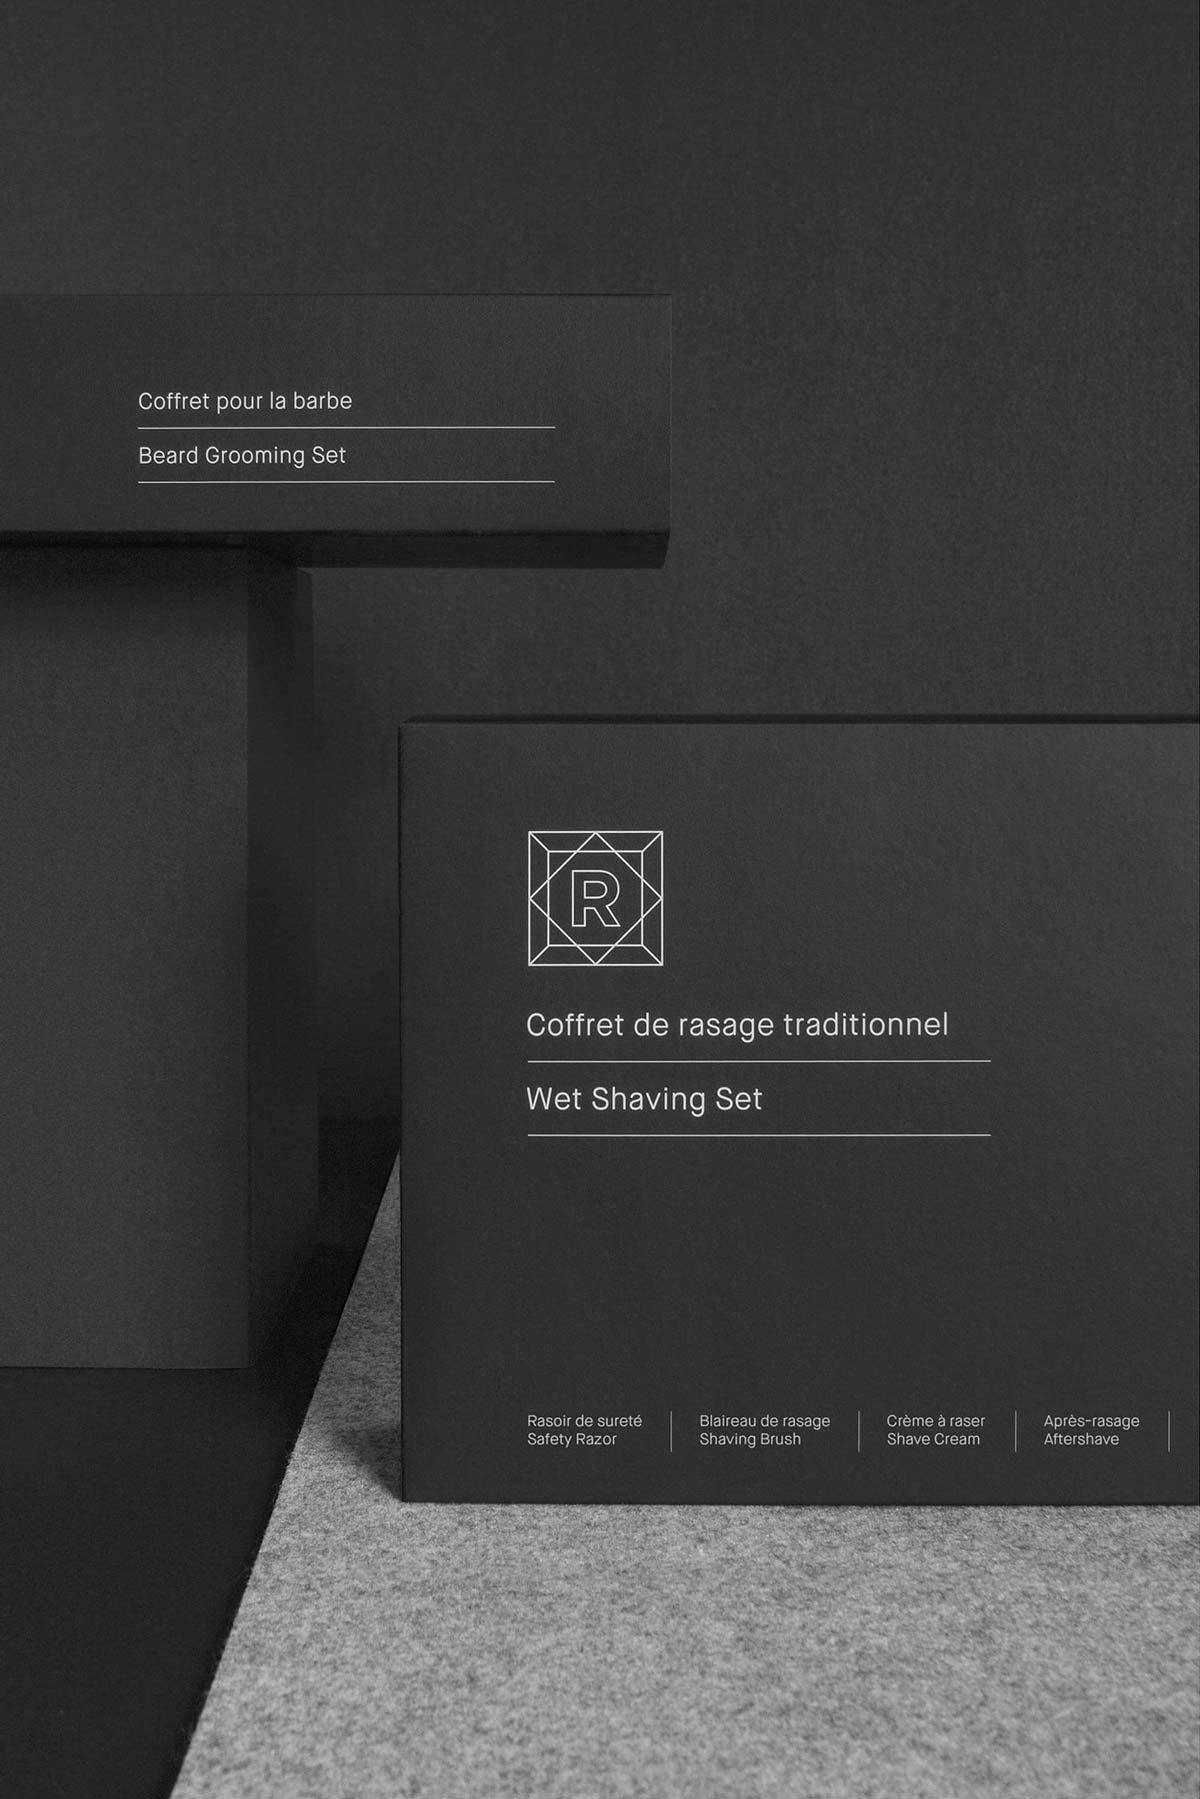 Figure-Jeremy-Hall-Design-Graphique-Logo-Branding-Image-De-Marque-Quebec-Rituels-Emballage-Packaging-Cosmetiques-Rasage-Boite-VIGNETTE.jpg